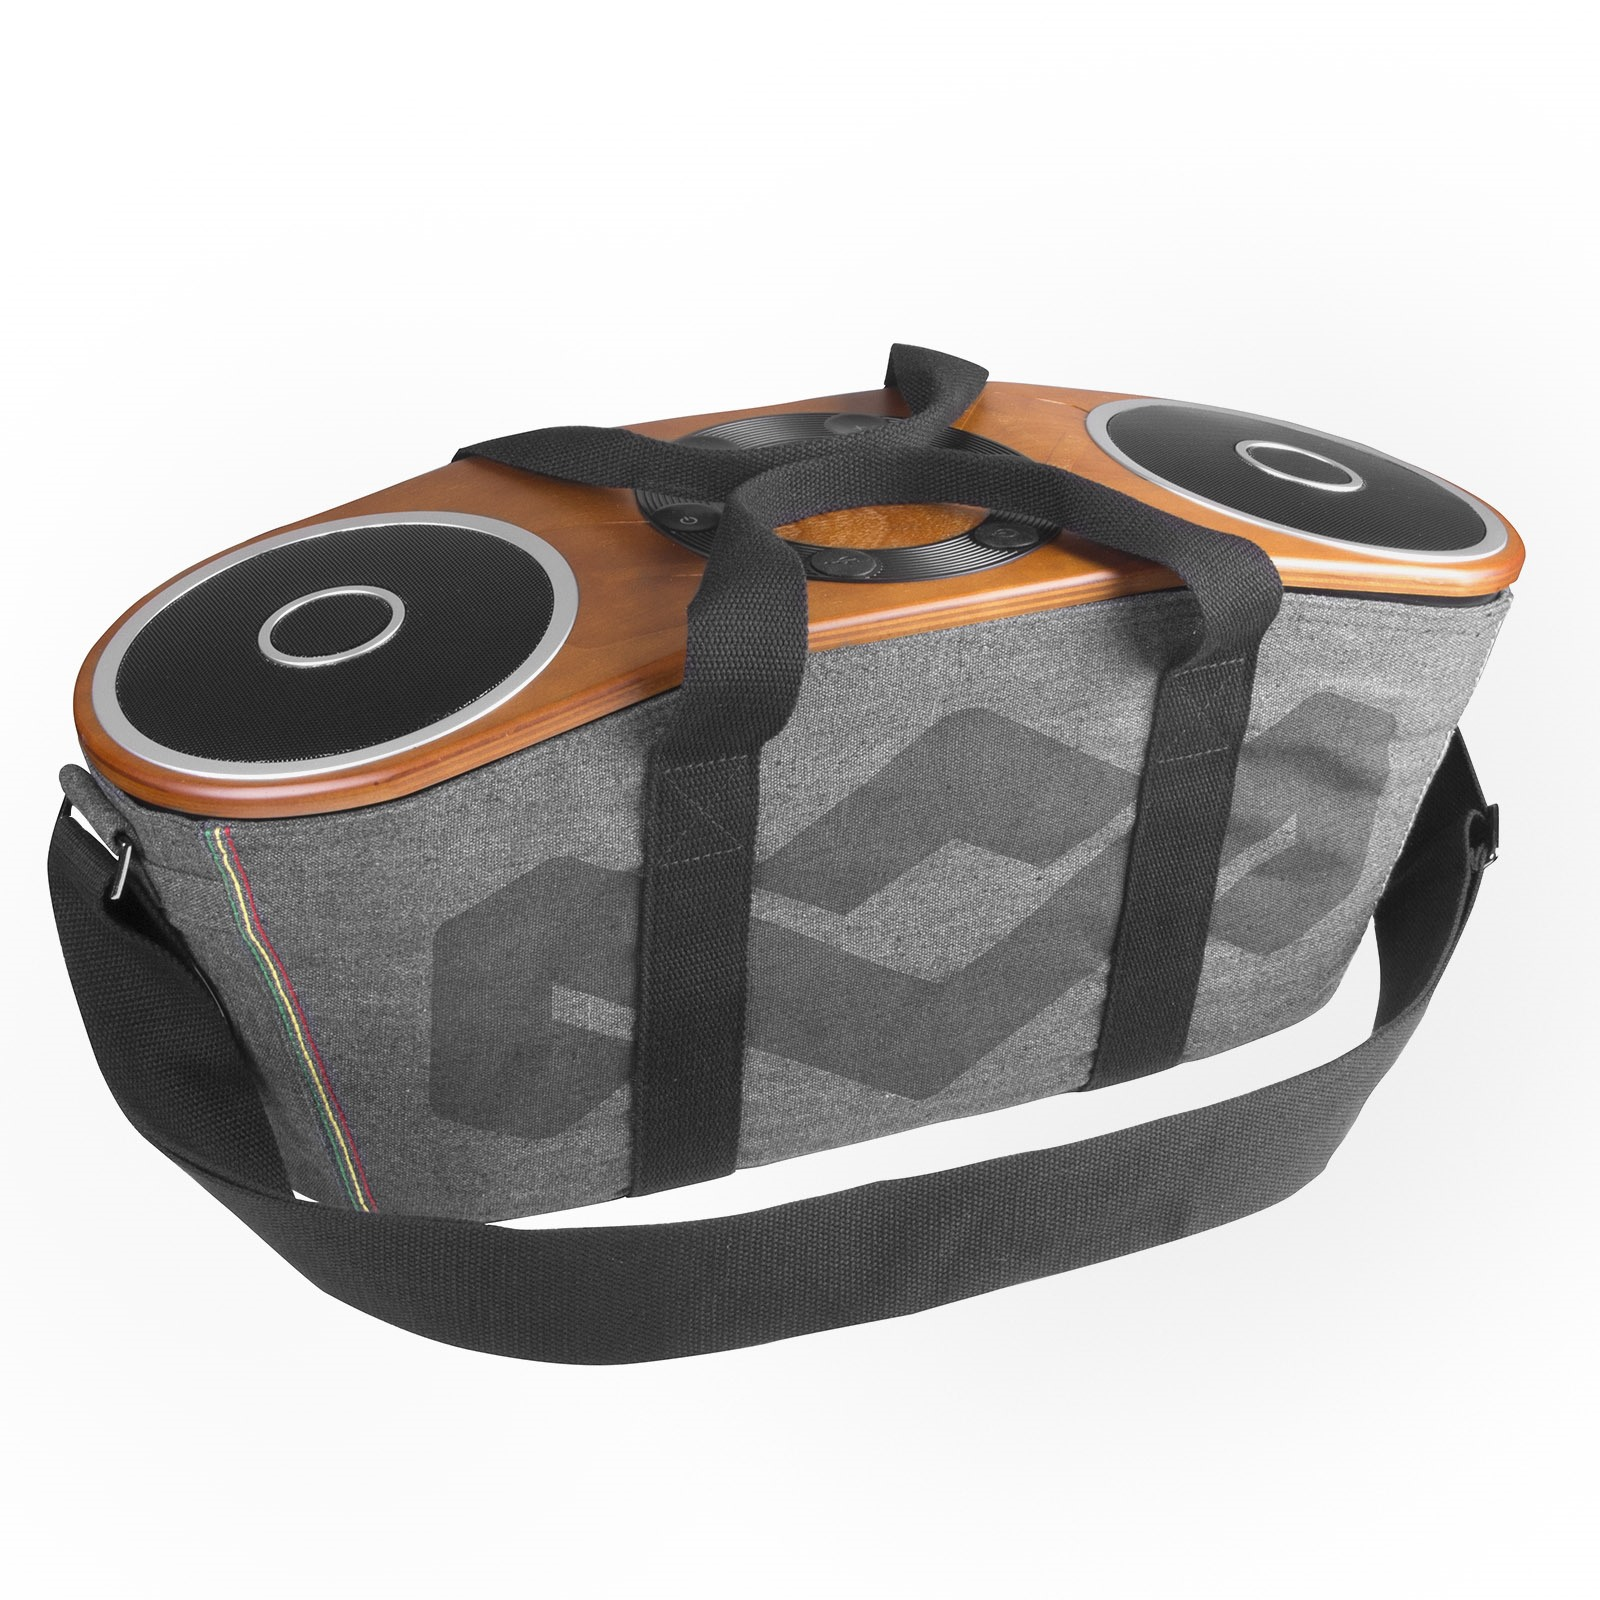 house of marley em ja010 mi bag of riddim bluetooth portable audio